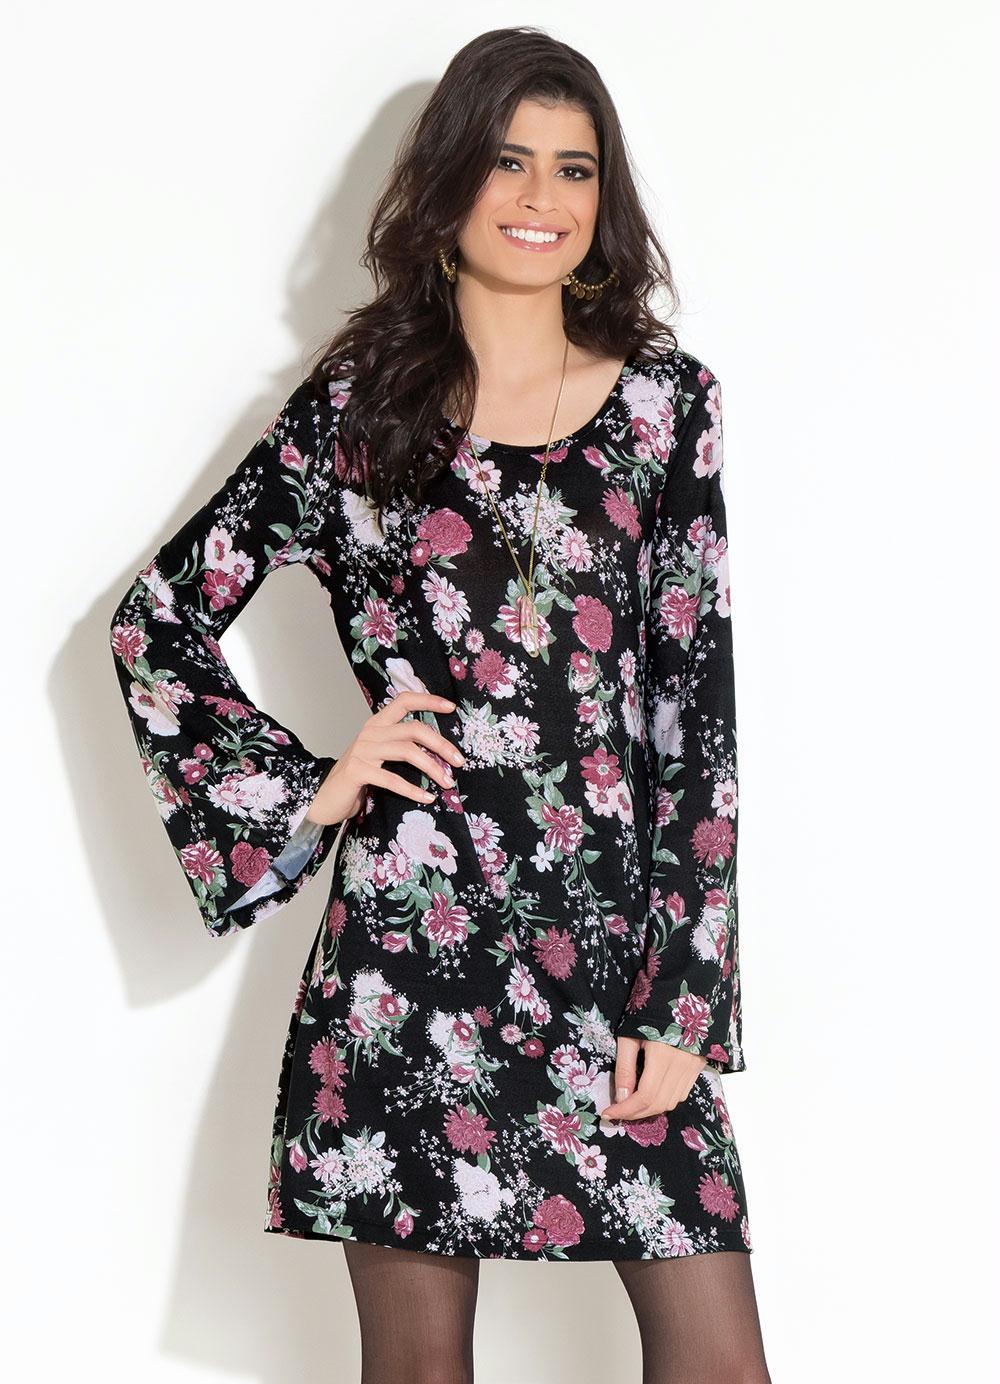 74a474254 Vestido Quintess Floral Preto Mangas Sino - Quintess